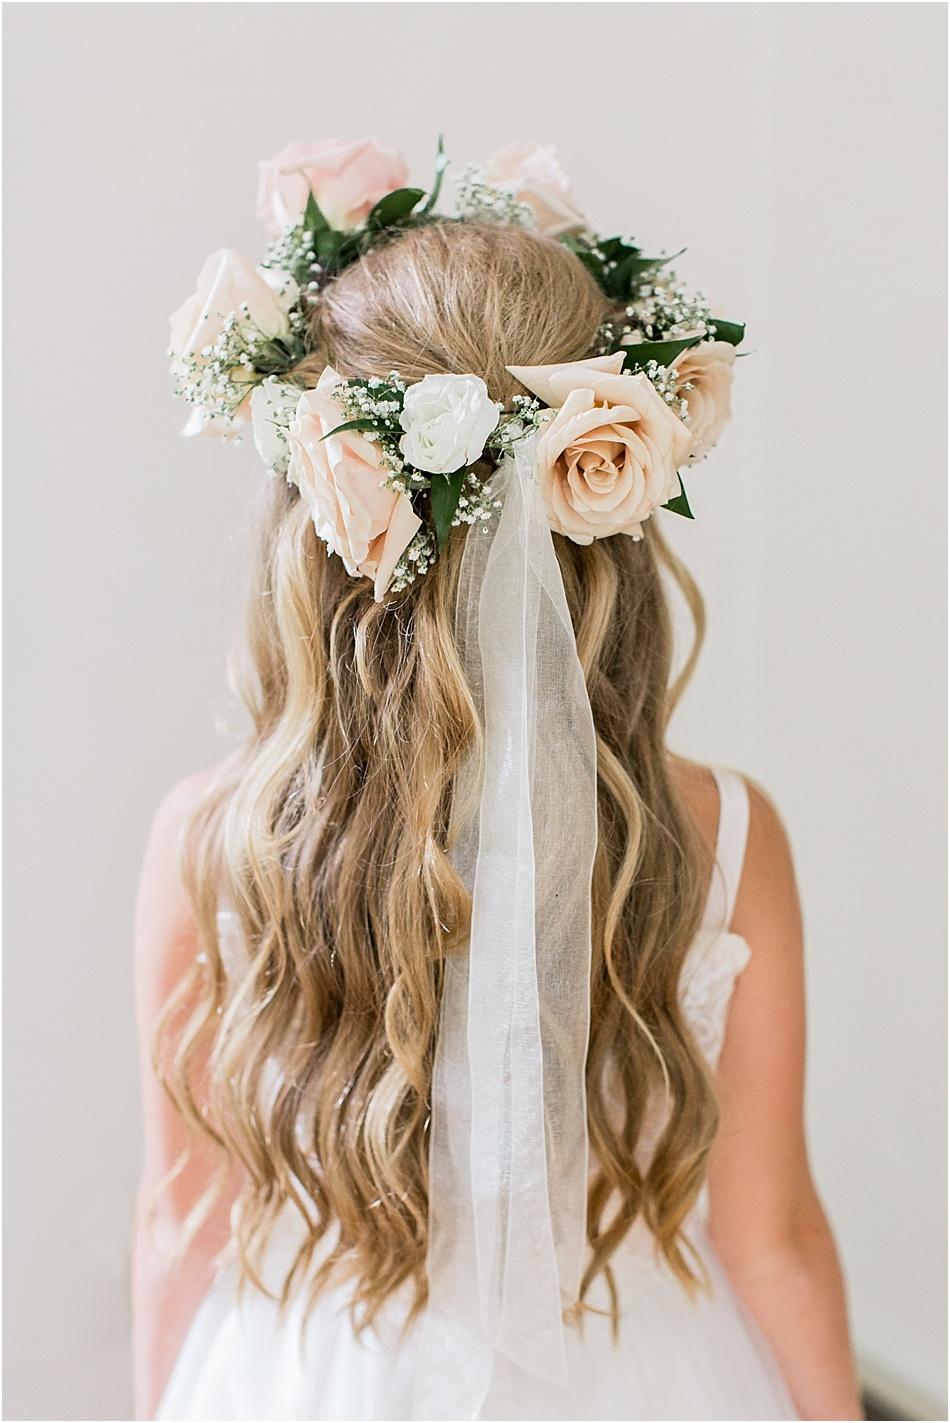 brookside_country_club_cape_cod_boston_wedding_photographer_Meredith_Jane_Photography_photo_0131.jpg